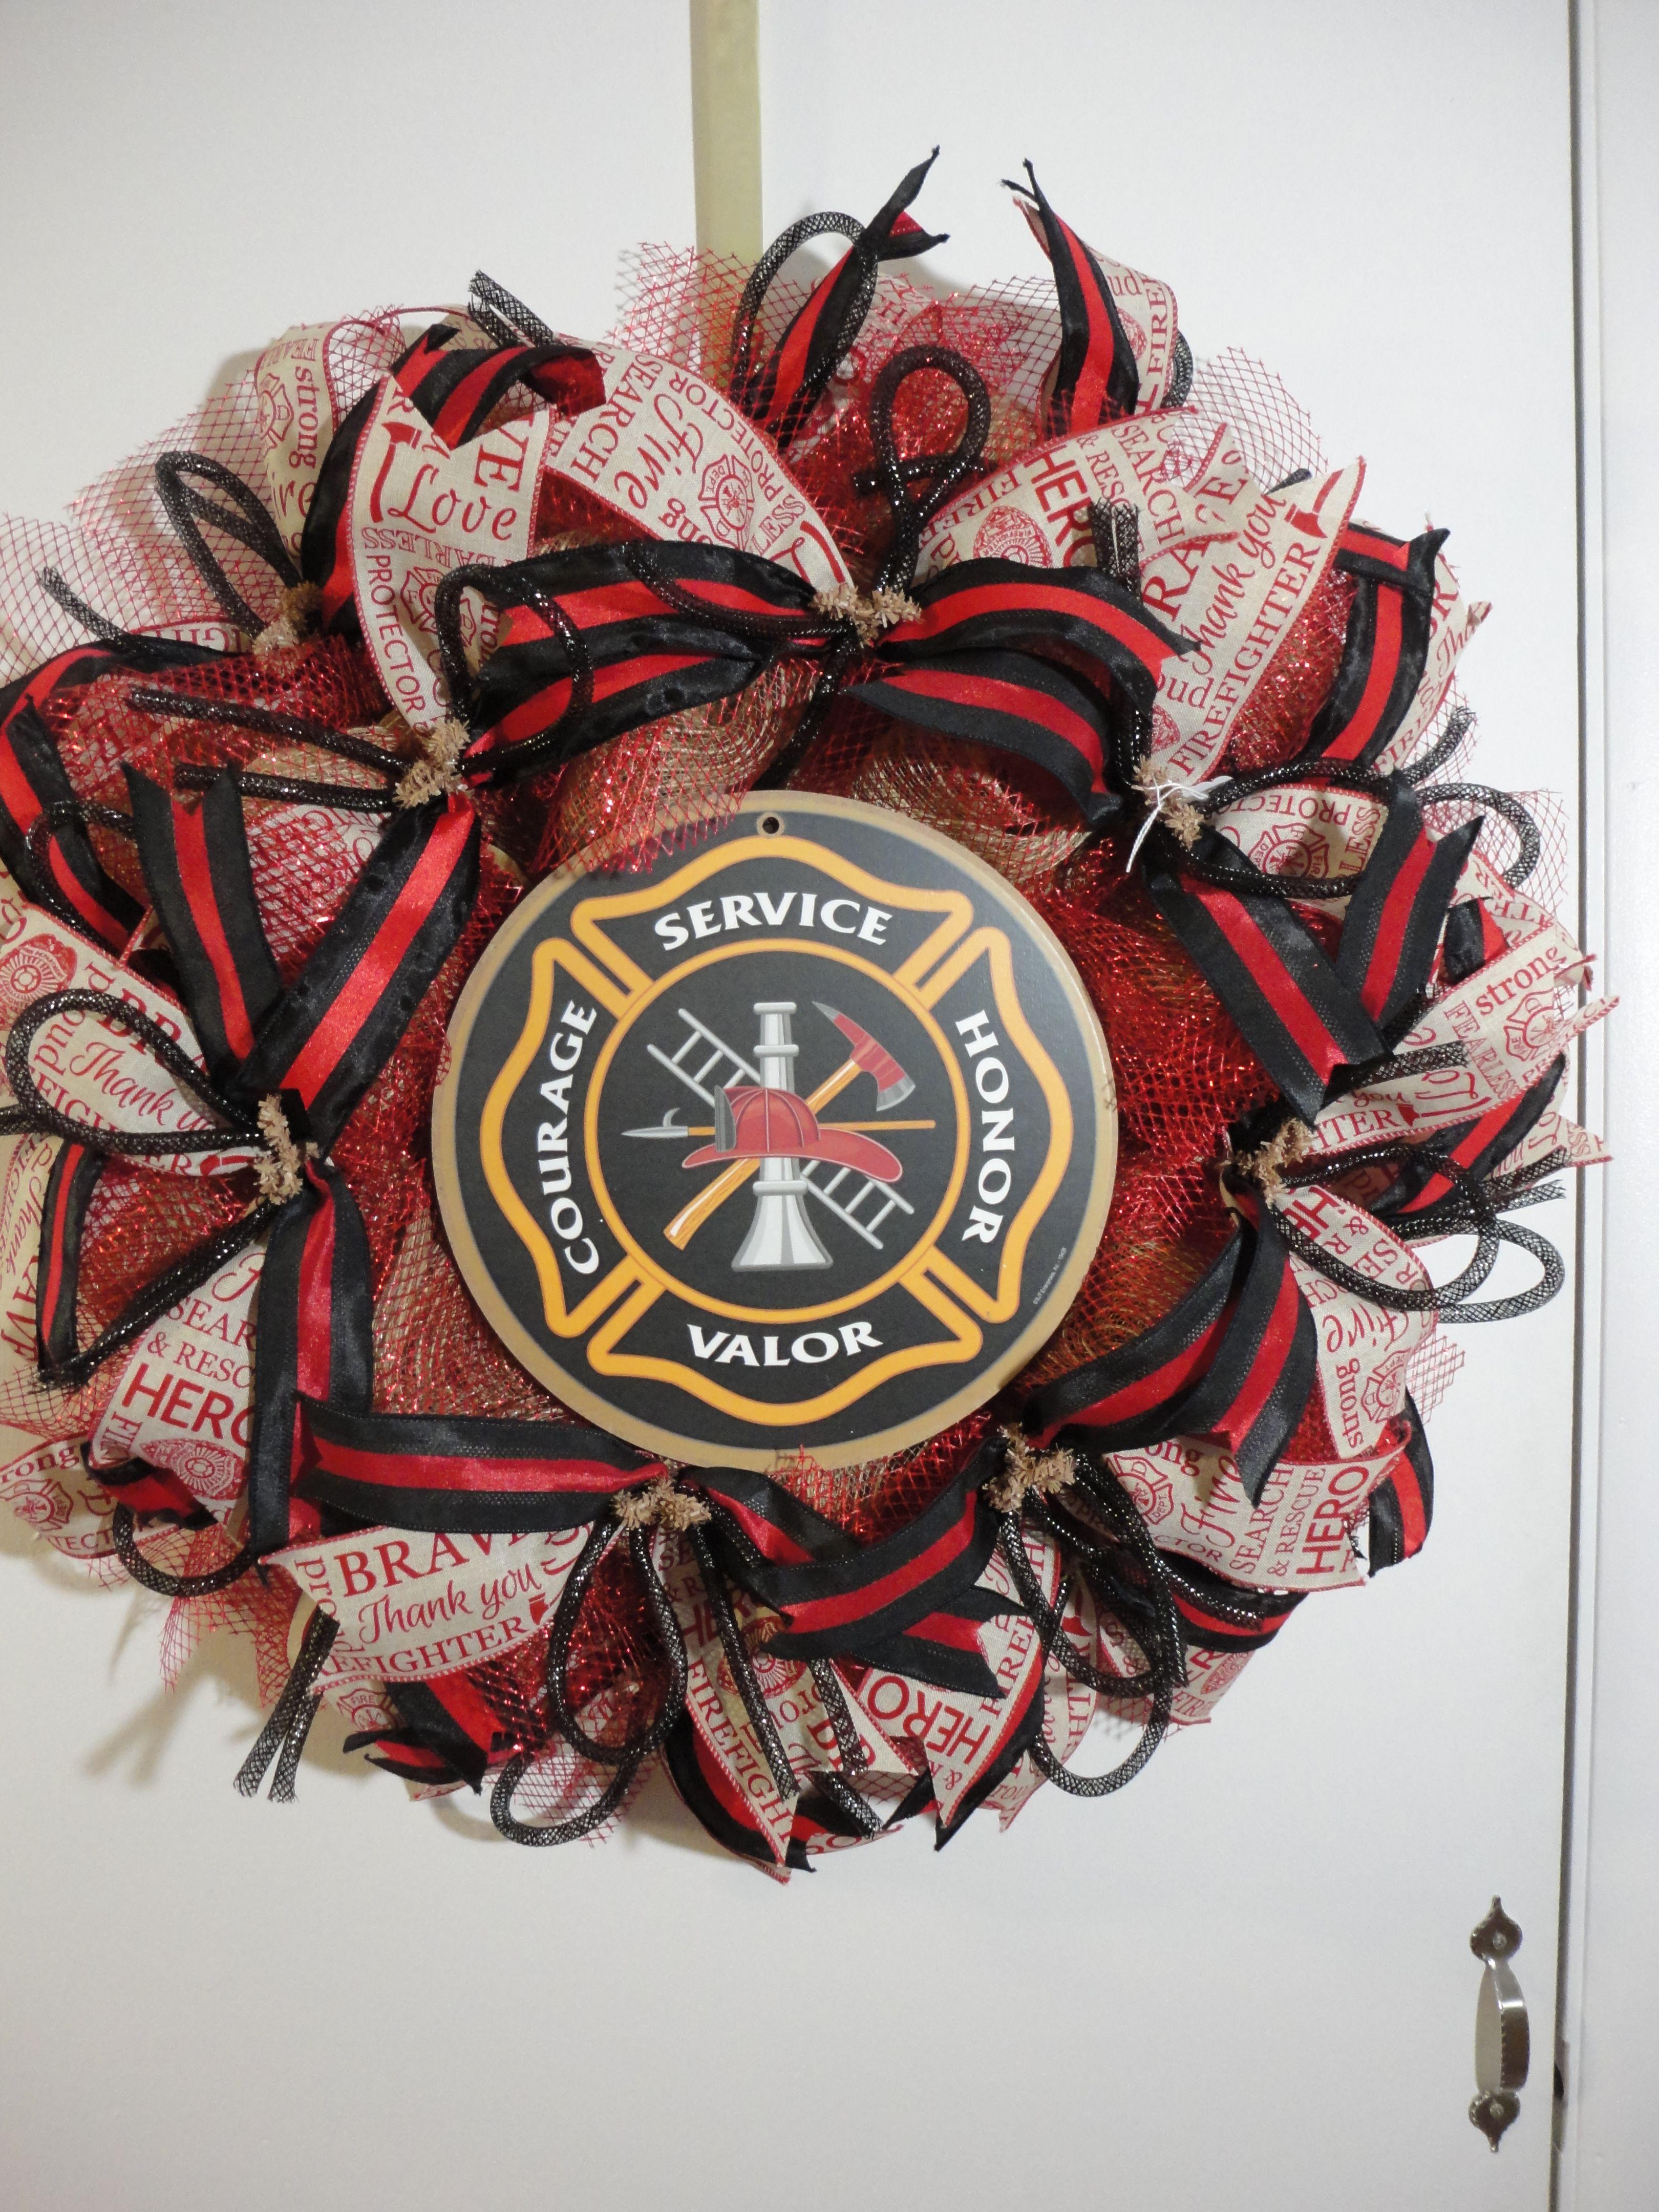 Fireman Wreath , Hero and Life Saver Military wreath